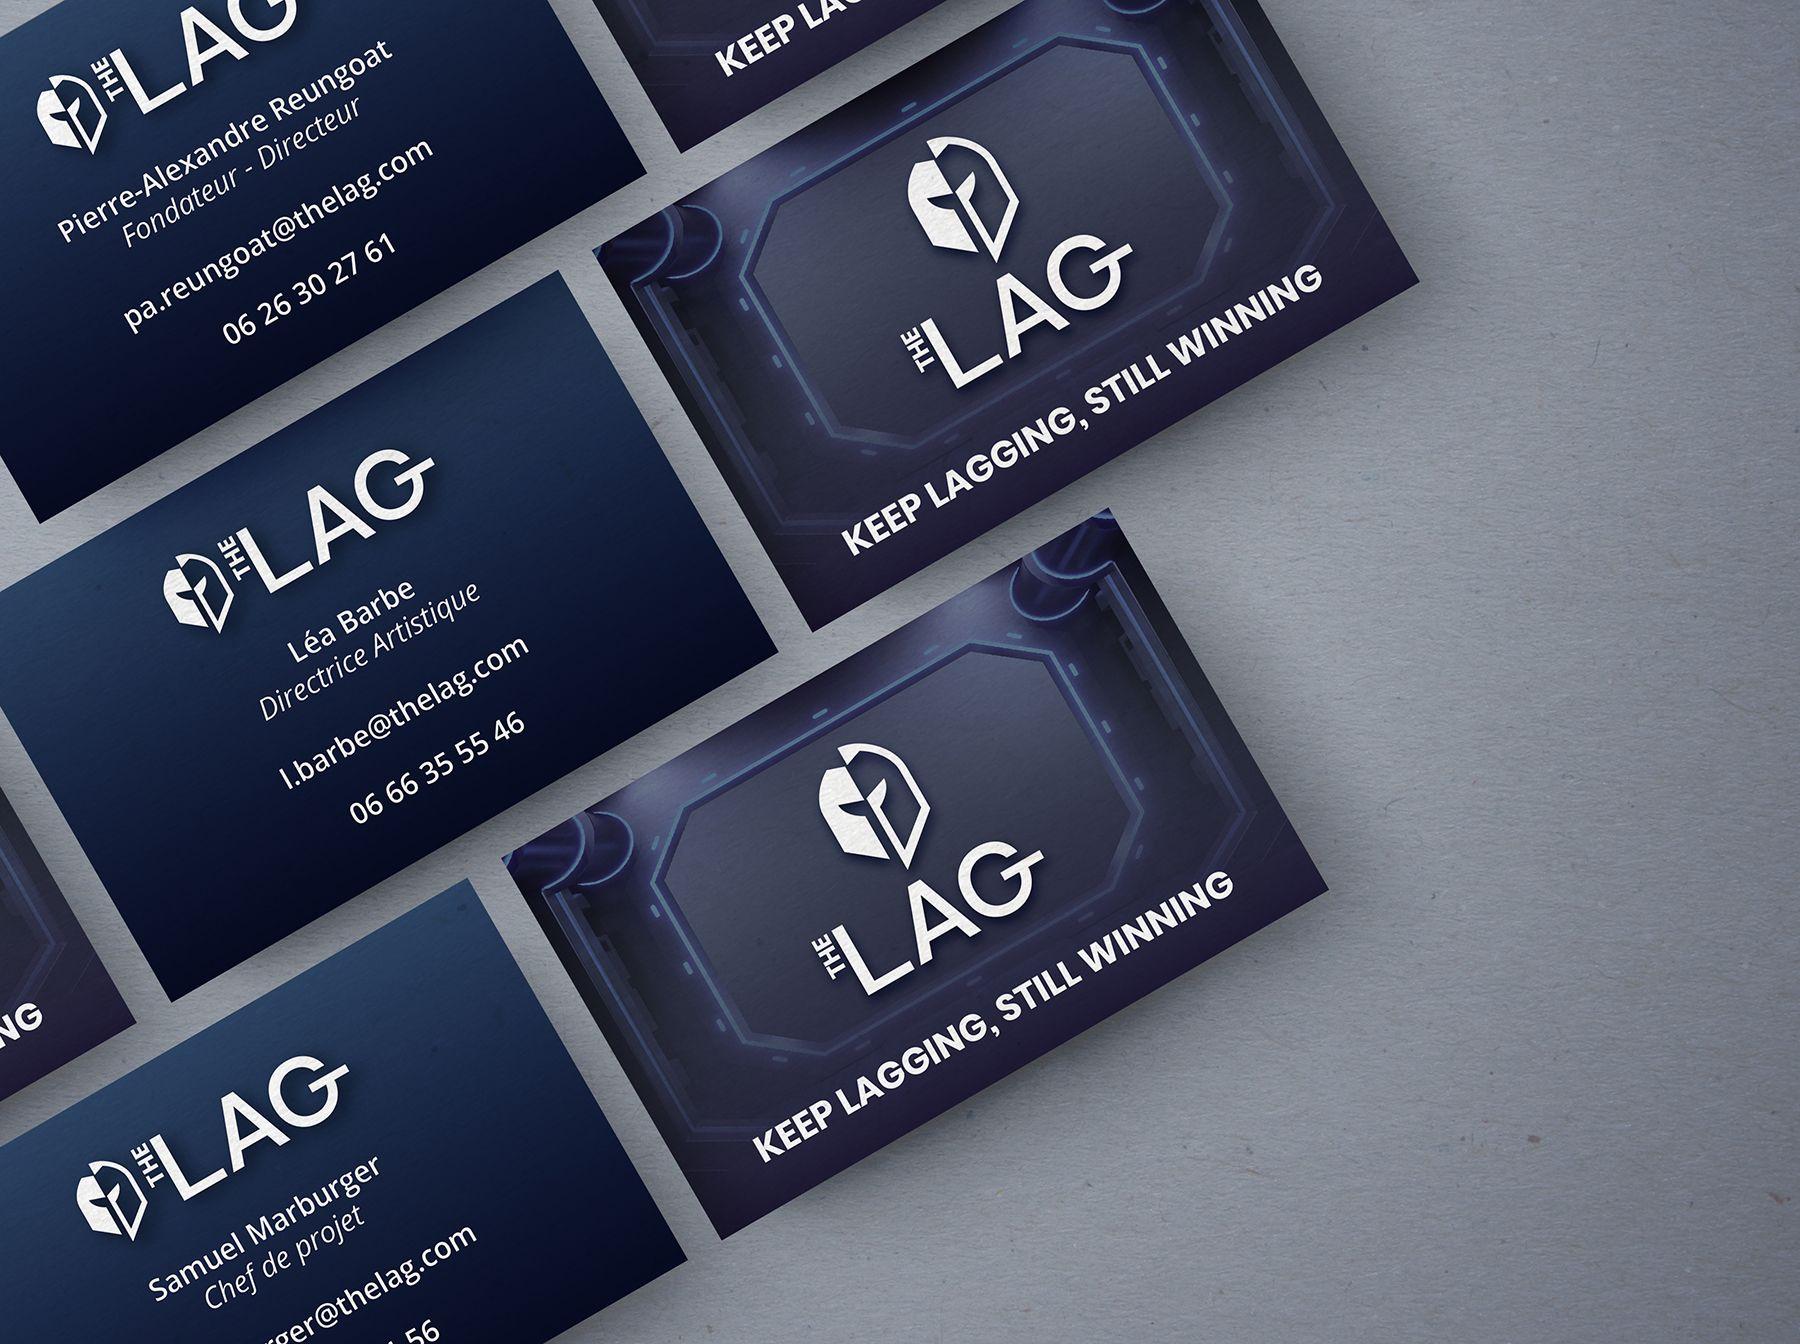 Cartes de visite The LAG